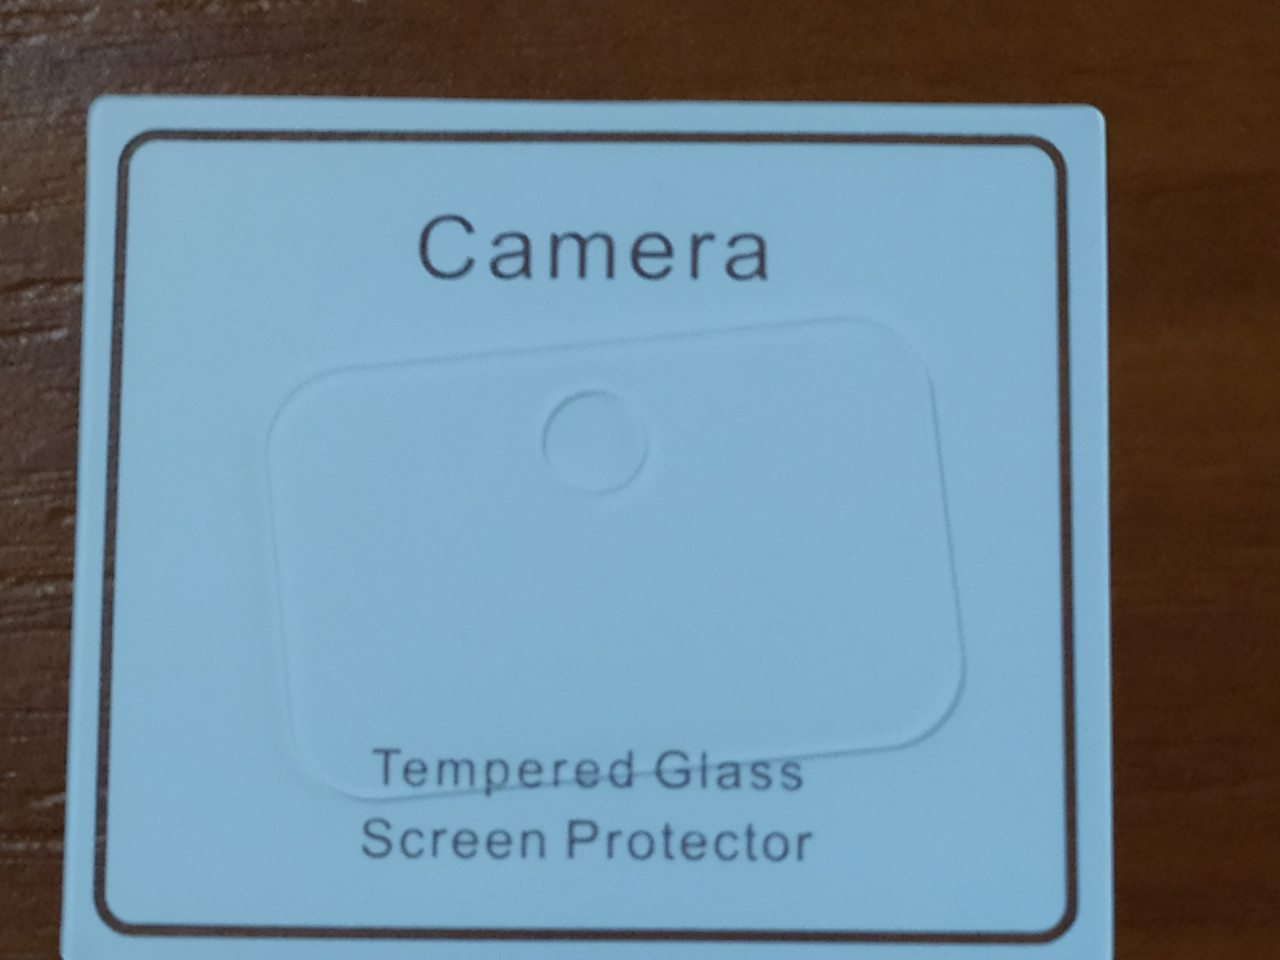 Захисне скло на камеру Tempered Glass Screen Protector для Samsung A51 2020